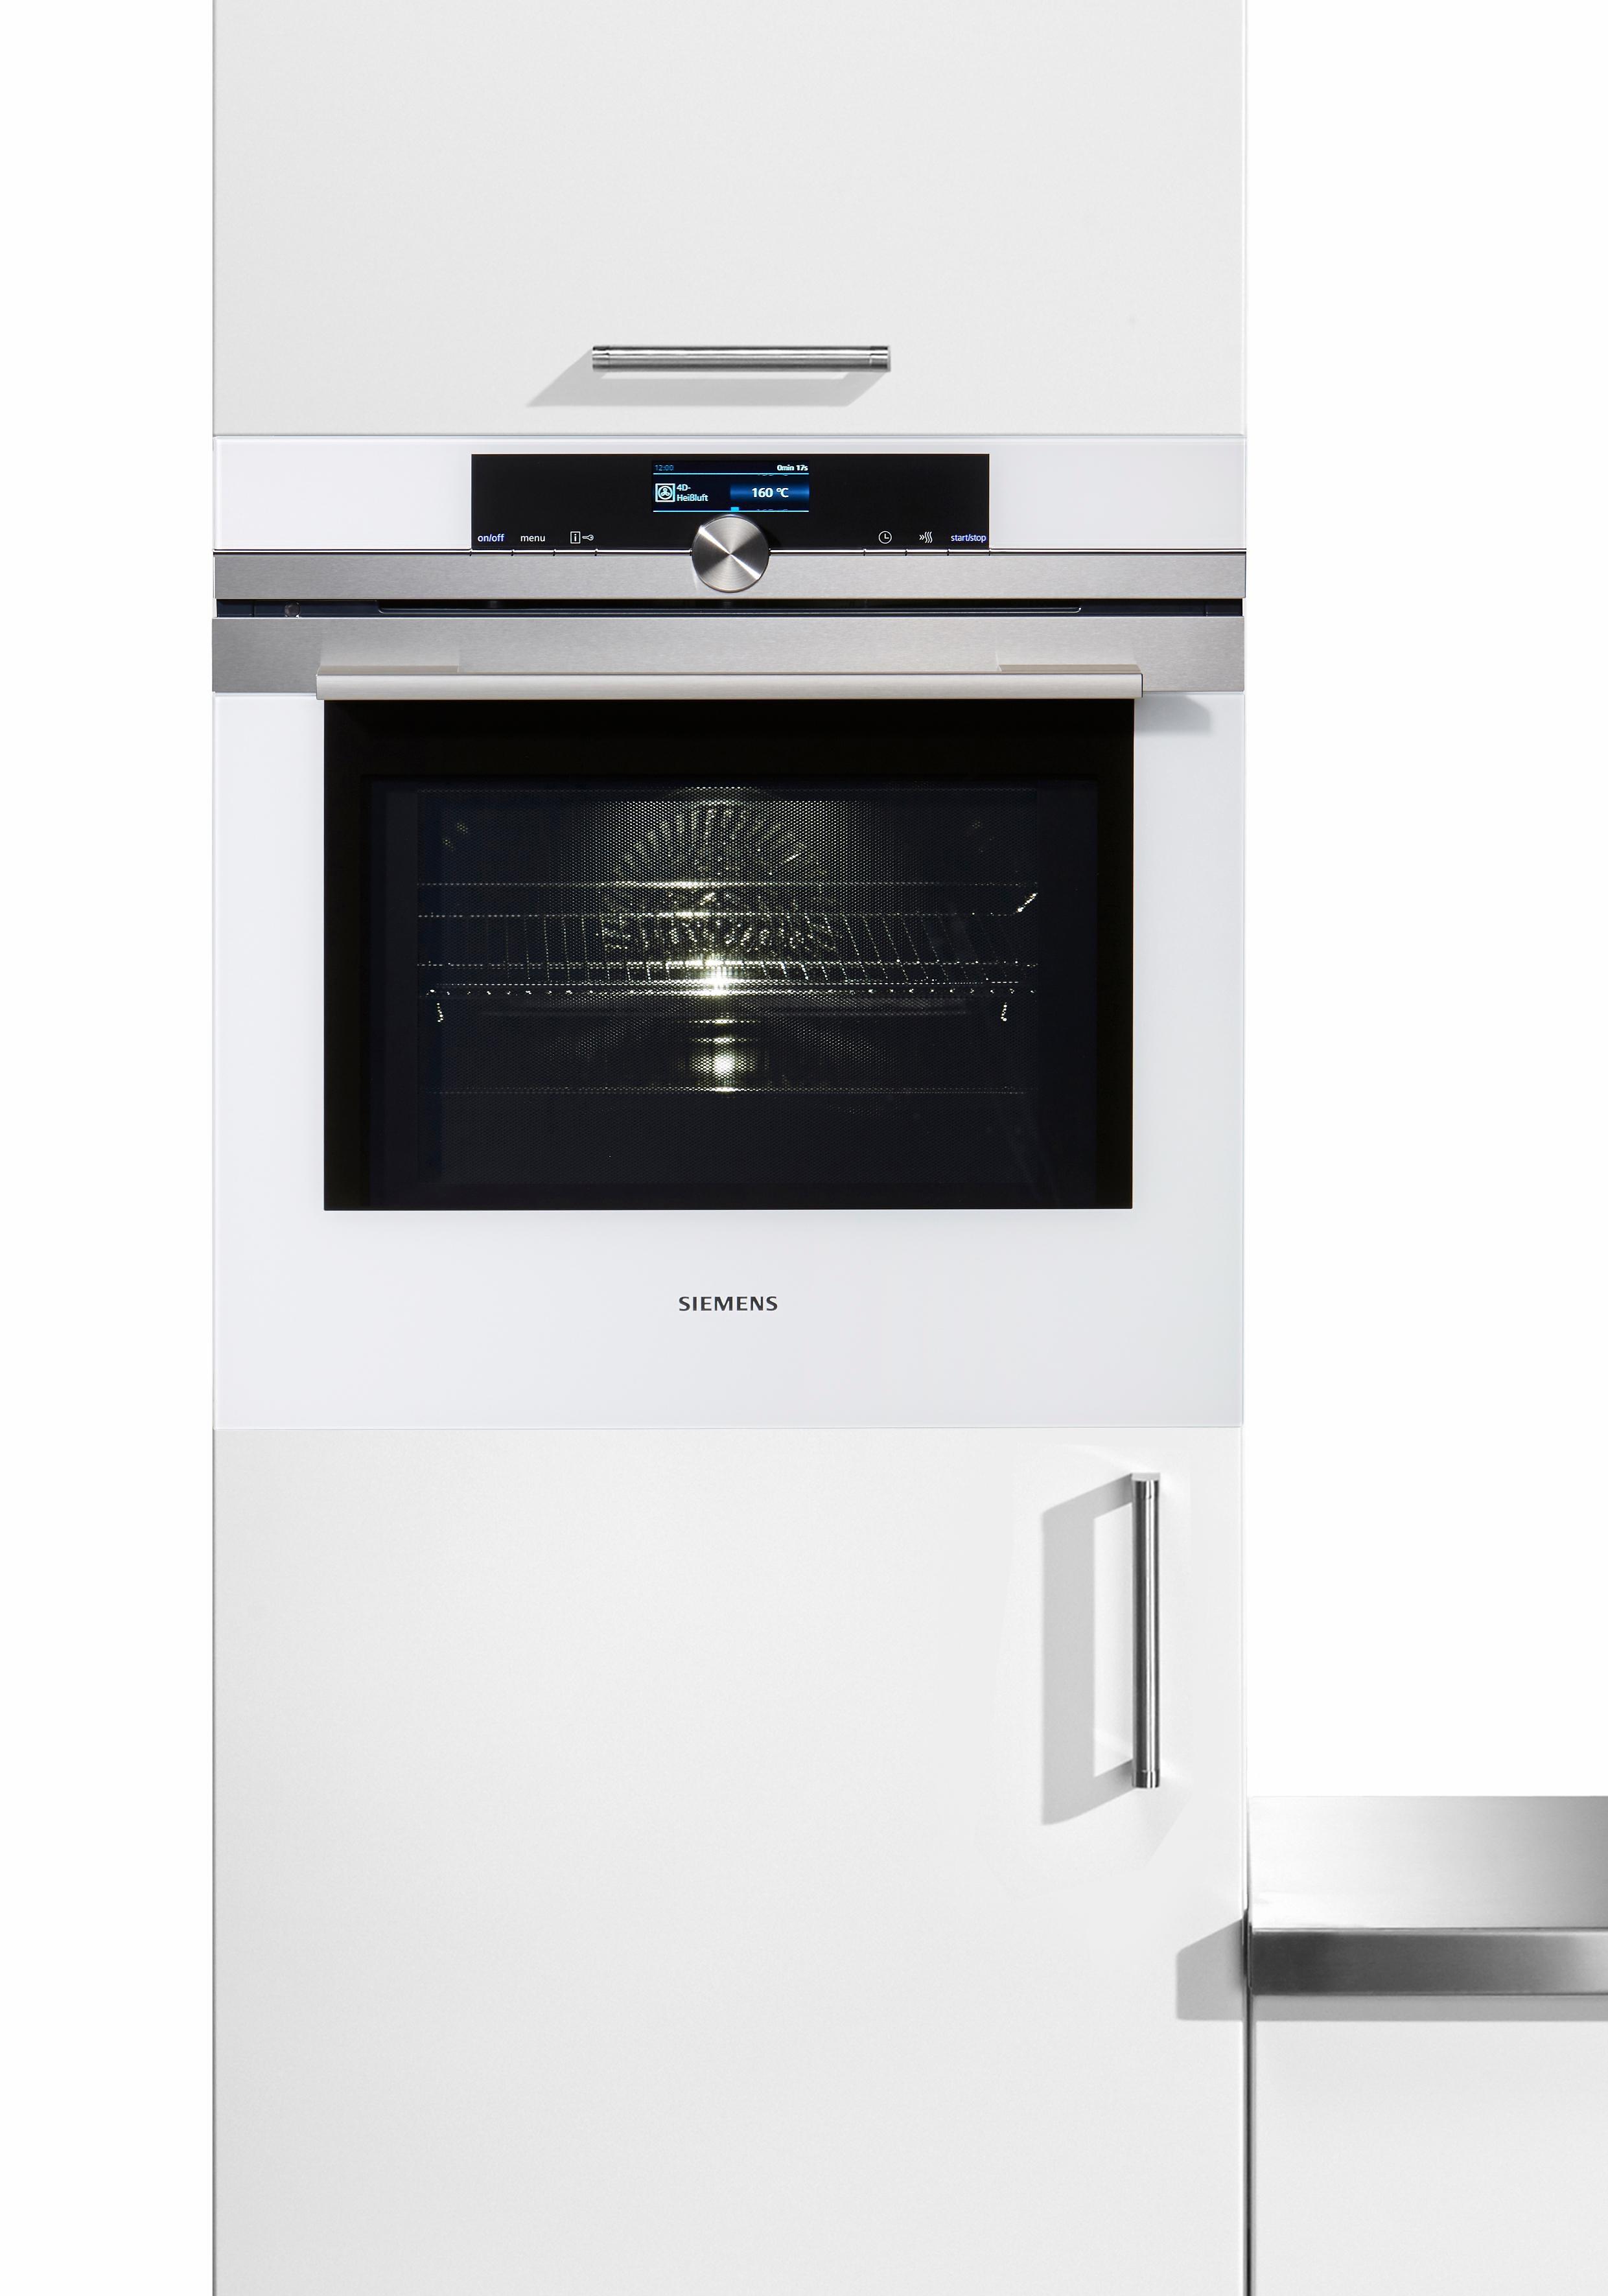 siemens oven met magnetron en pyrolyse zelfreiniging iq700 hm676g0w1 in de online shop otto. Black Bedroom Furniture Sets. Home Design Ideas